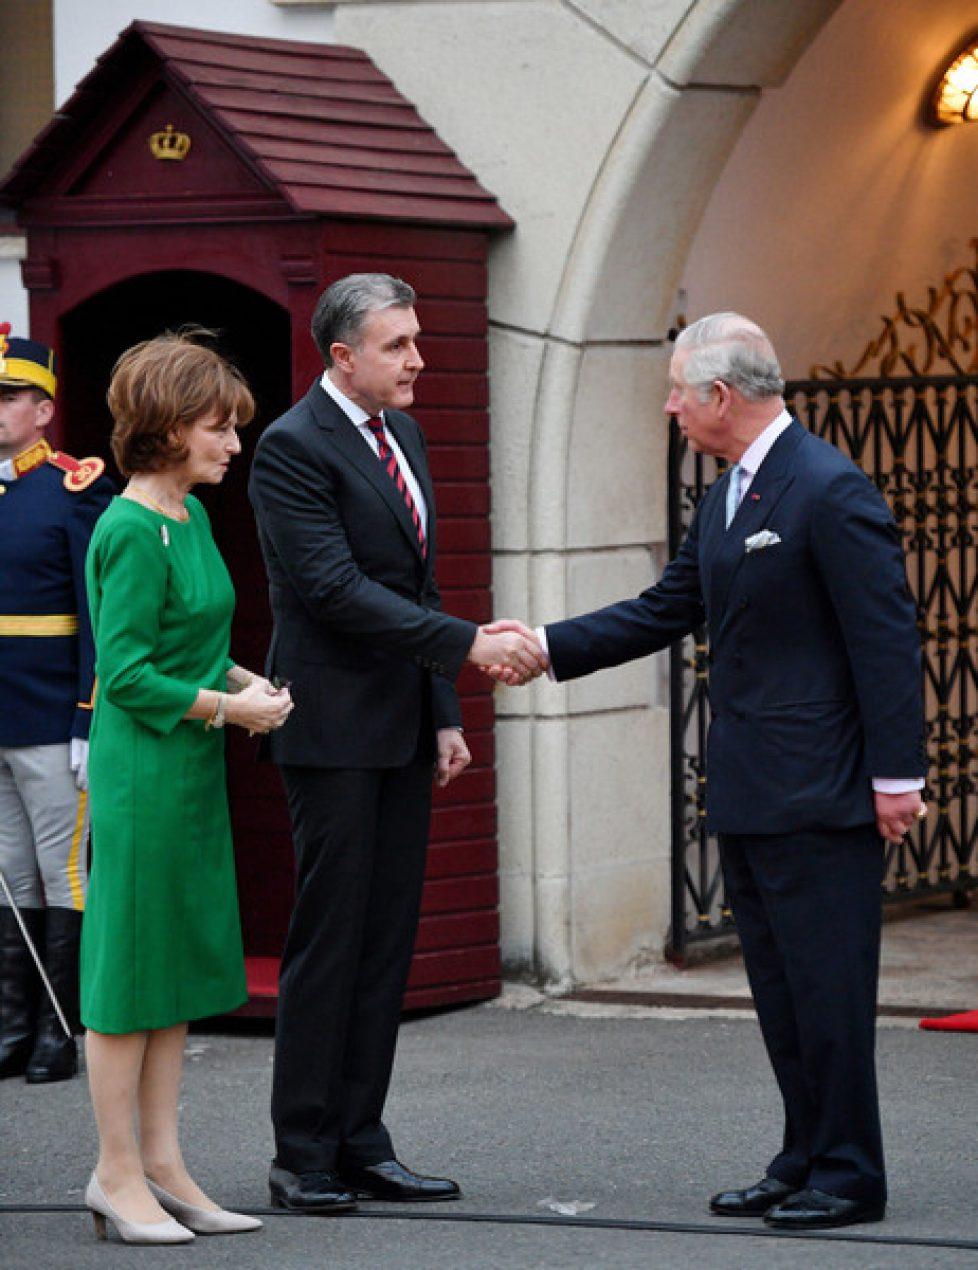 Prince+Wales+Visits+Romania+Day+2+t69tWmHWjwLl